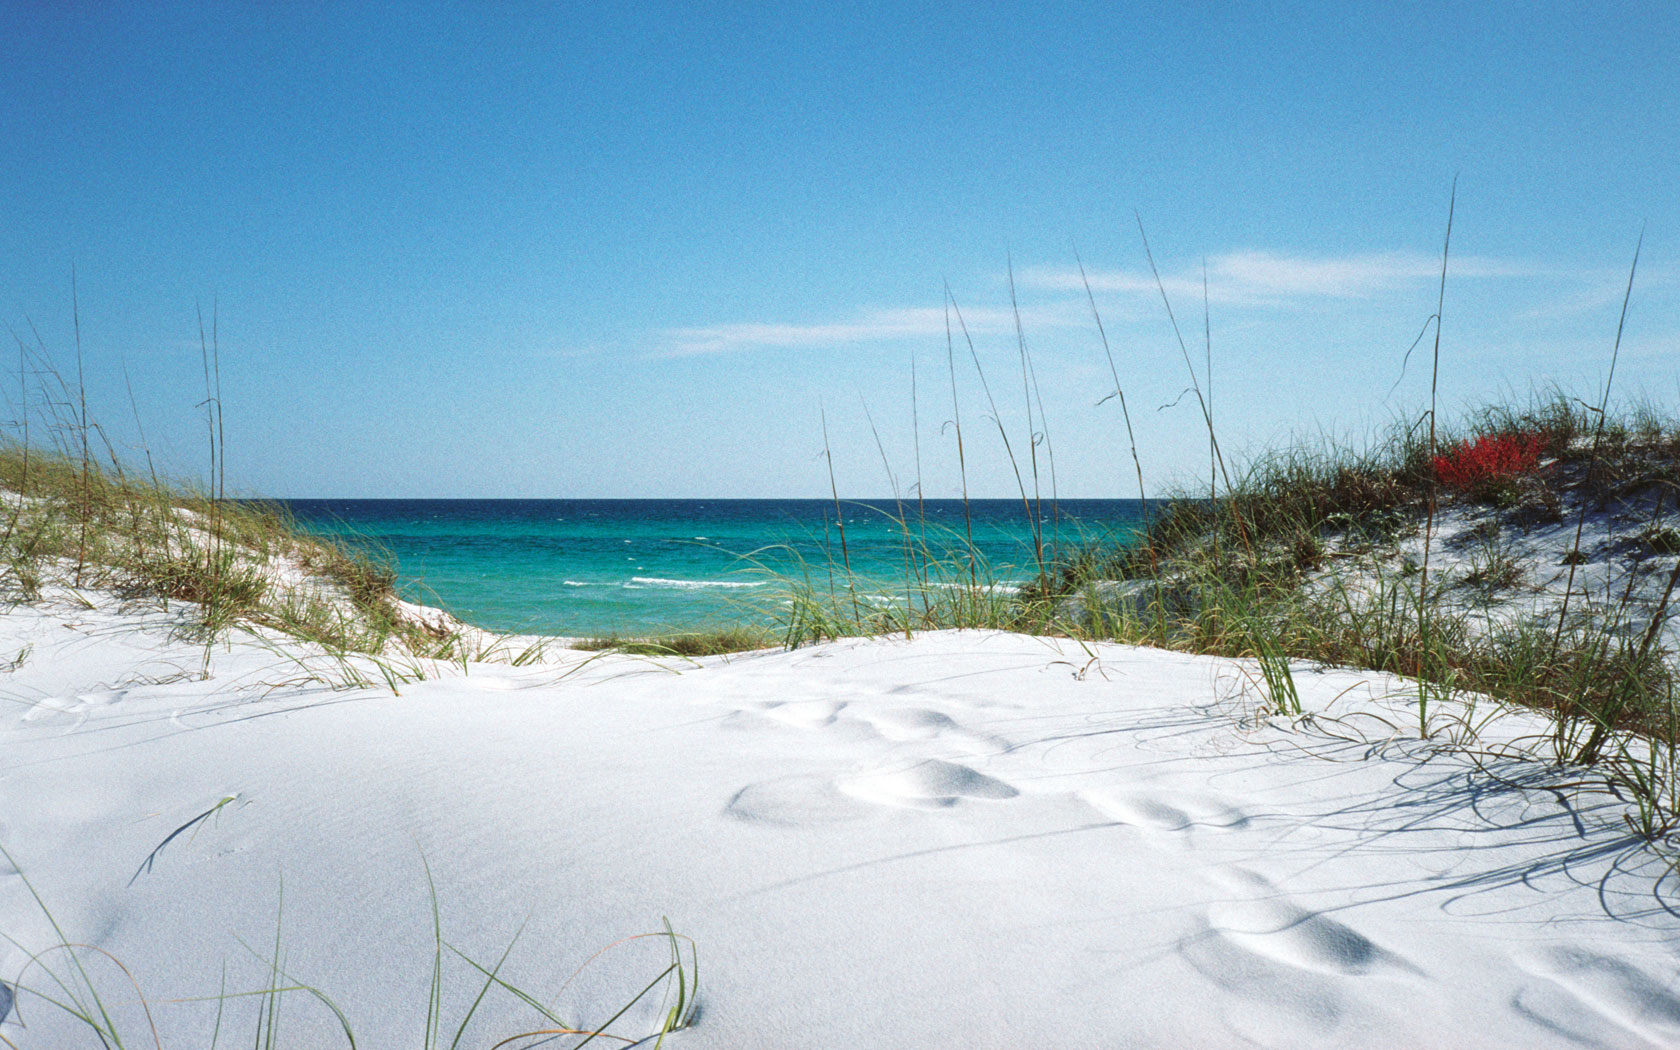 Wallpaper Clearwater Fl: Florida Beach Scene Wallpaper